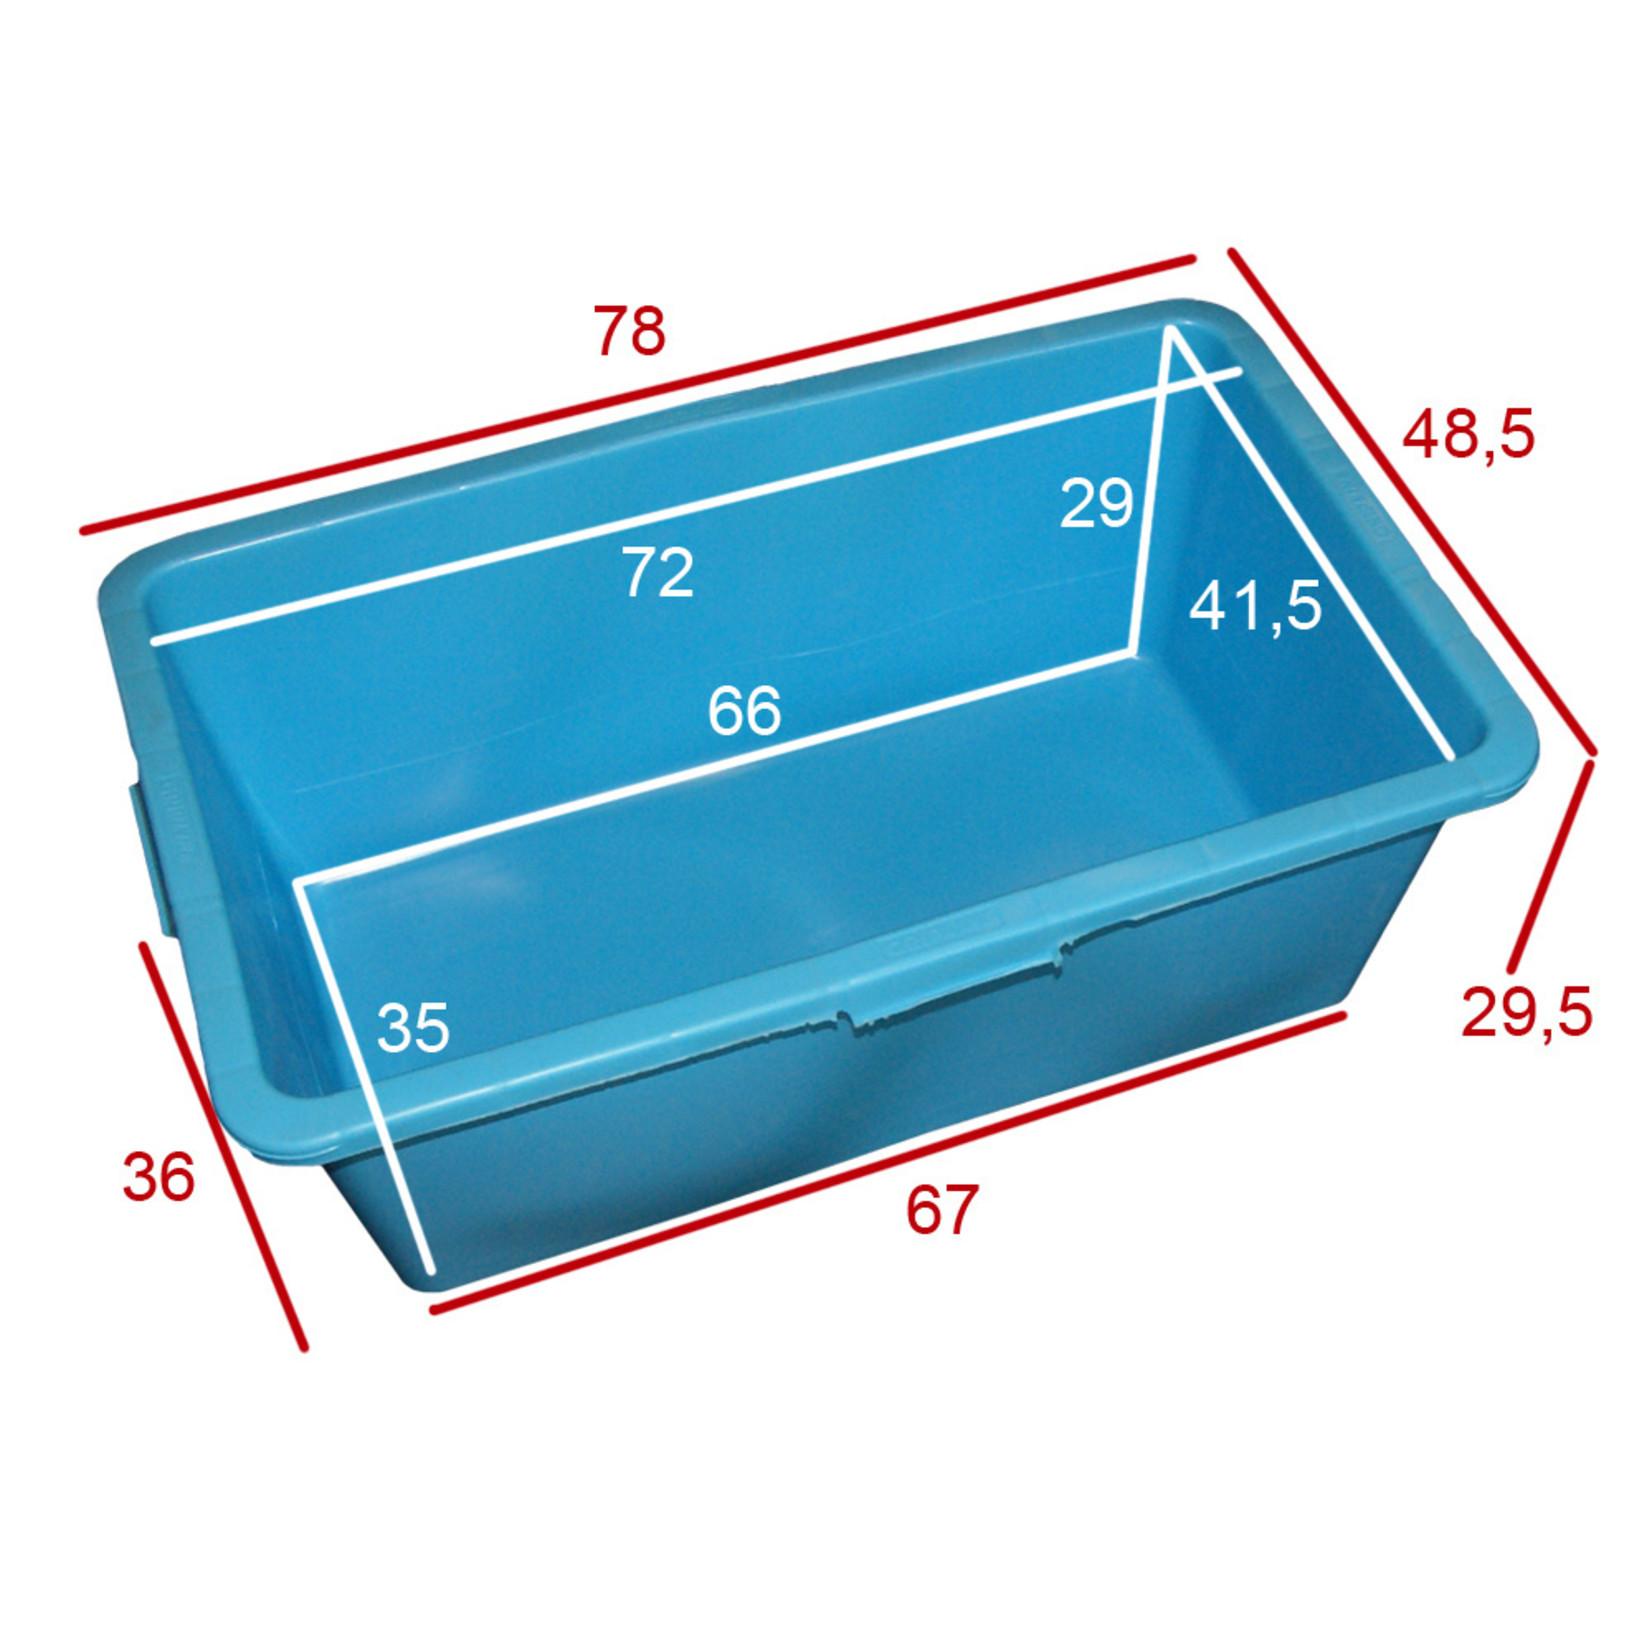 Rechthoek kuip 90 liter blauw l.79 x b.48 x h.30 cm